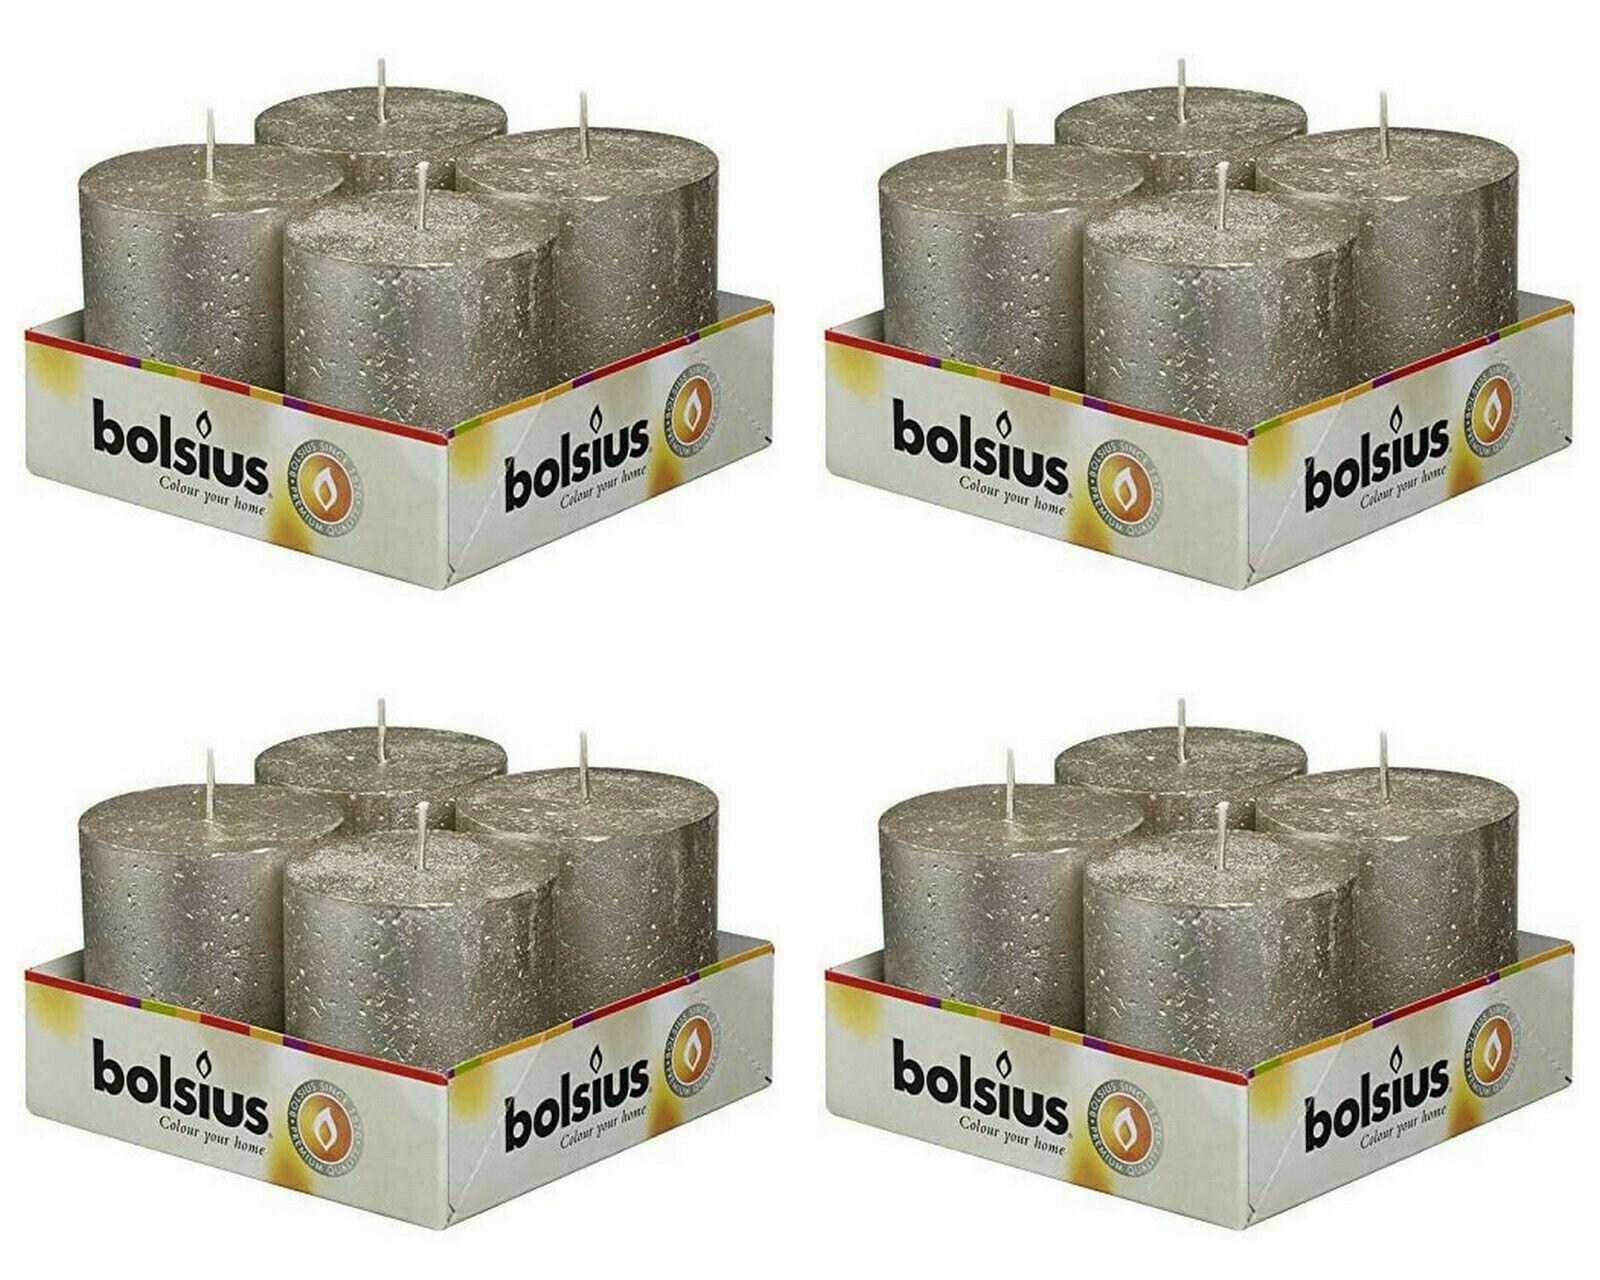 16 Stück Bolsius Rustik Stumpenkerzen 80x68 mm Metallic Champagner Rustic Kerzen